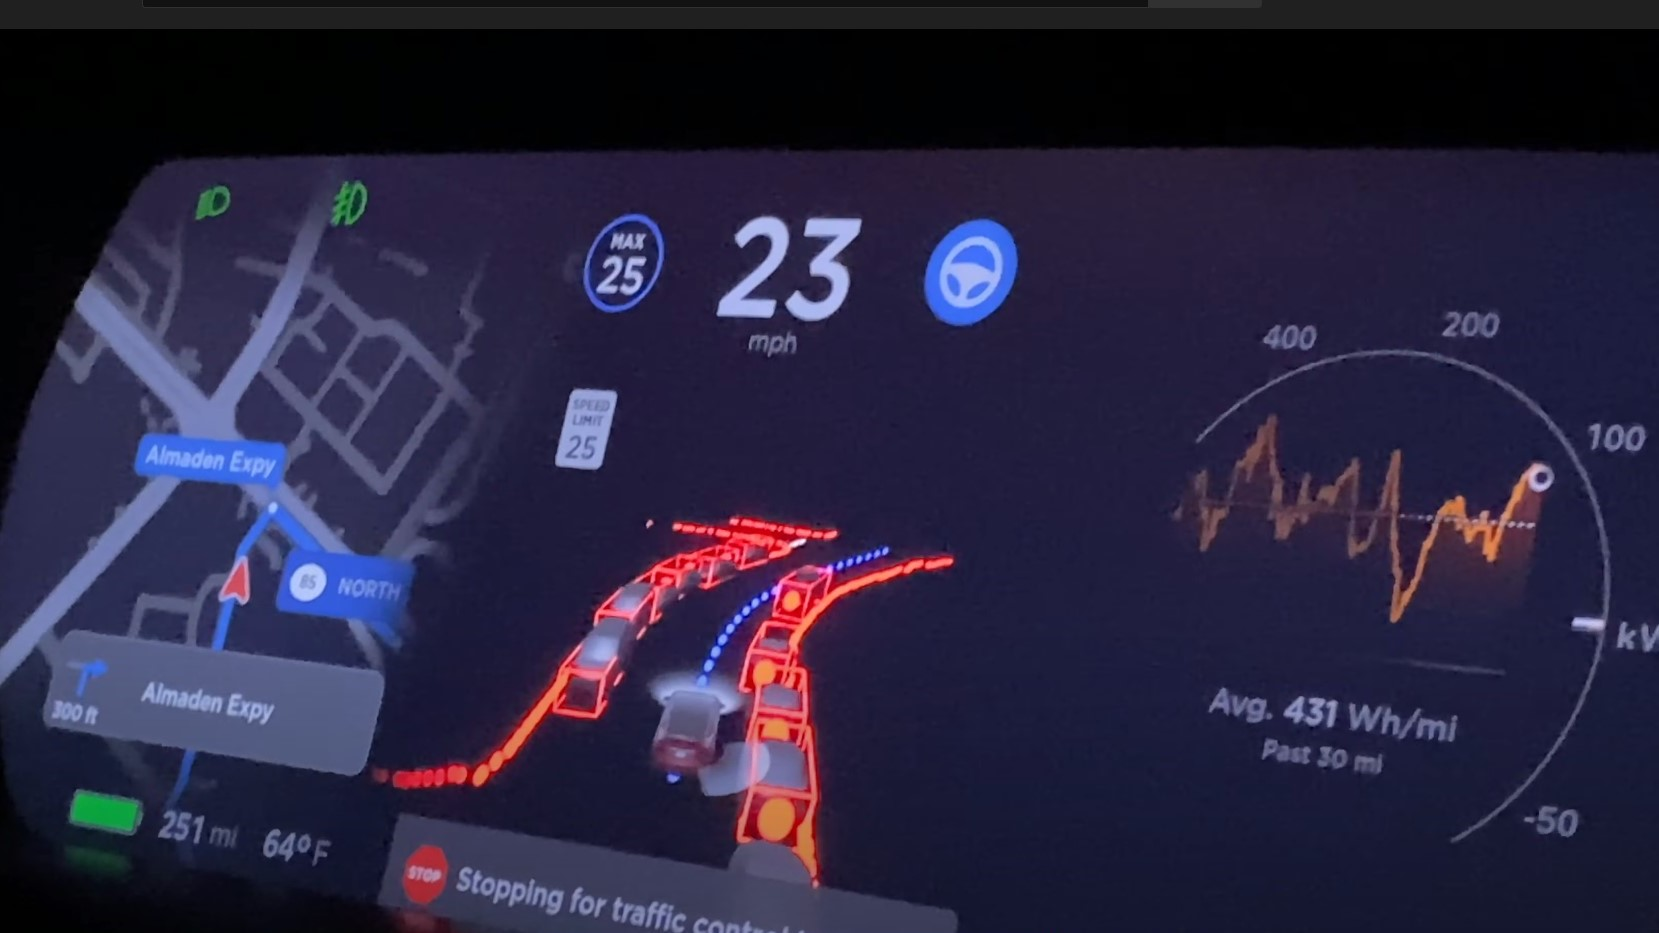 Conducción autónoma total